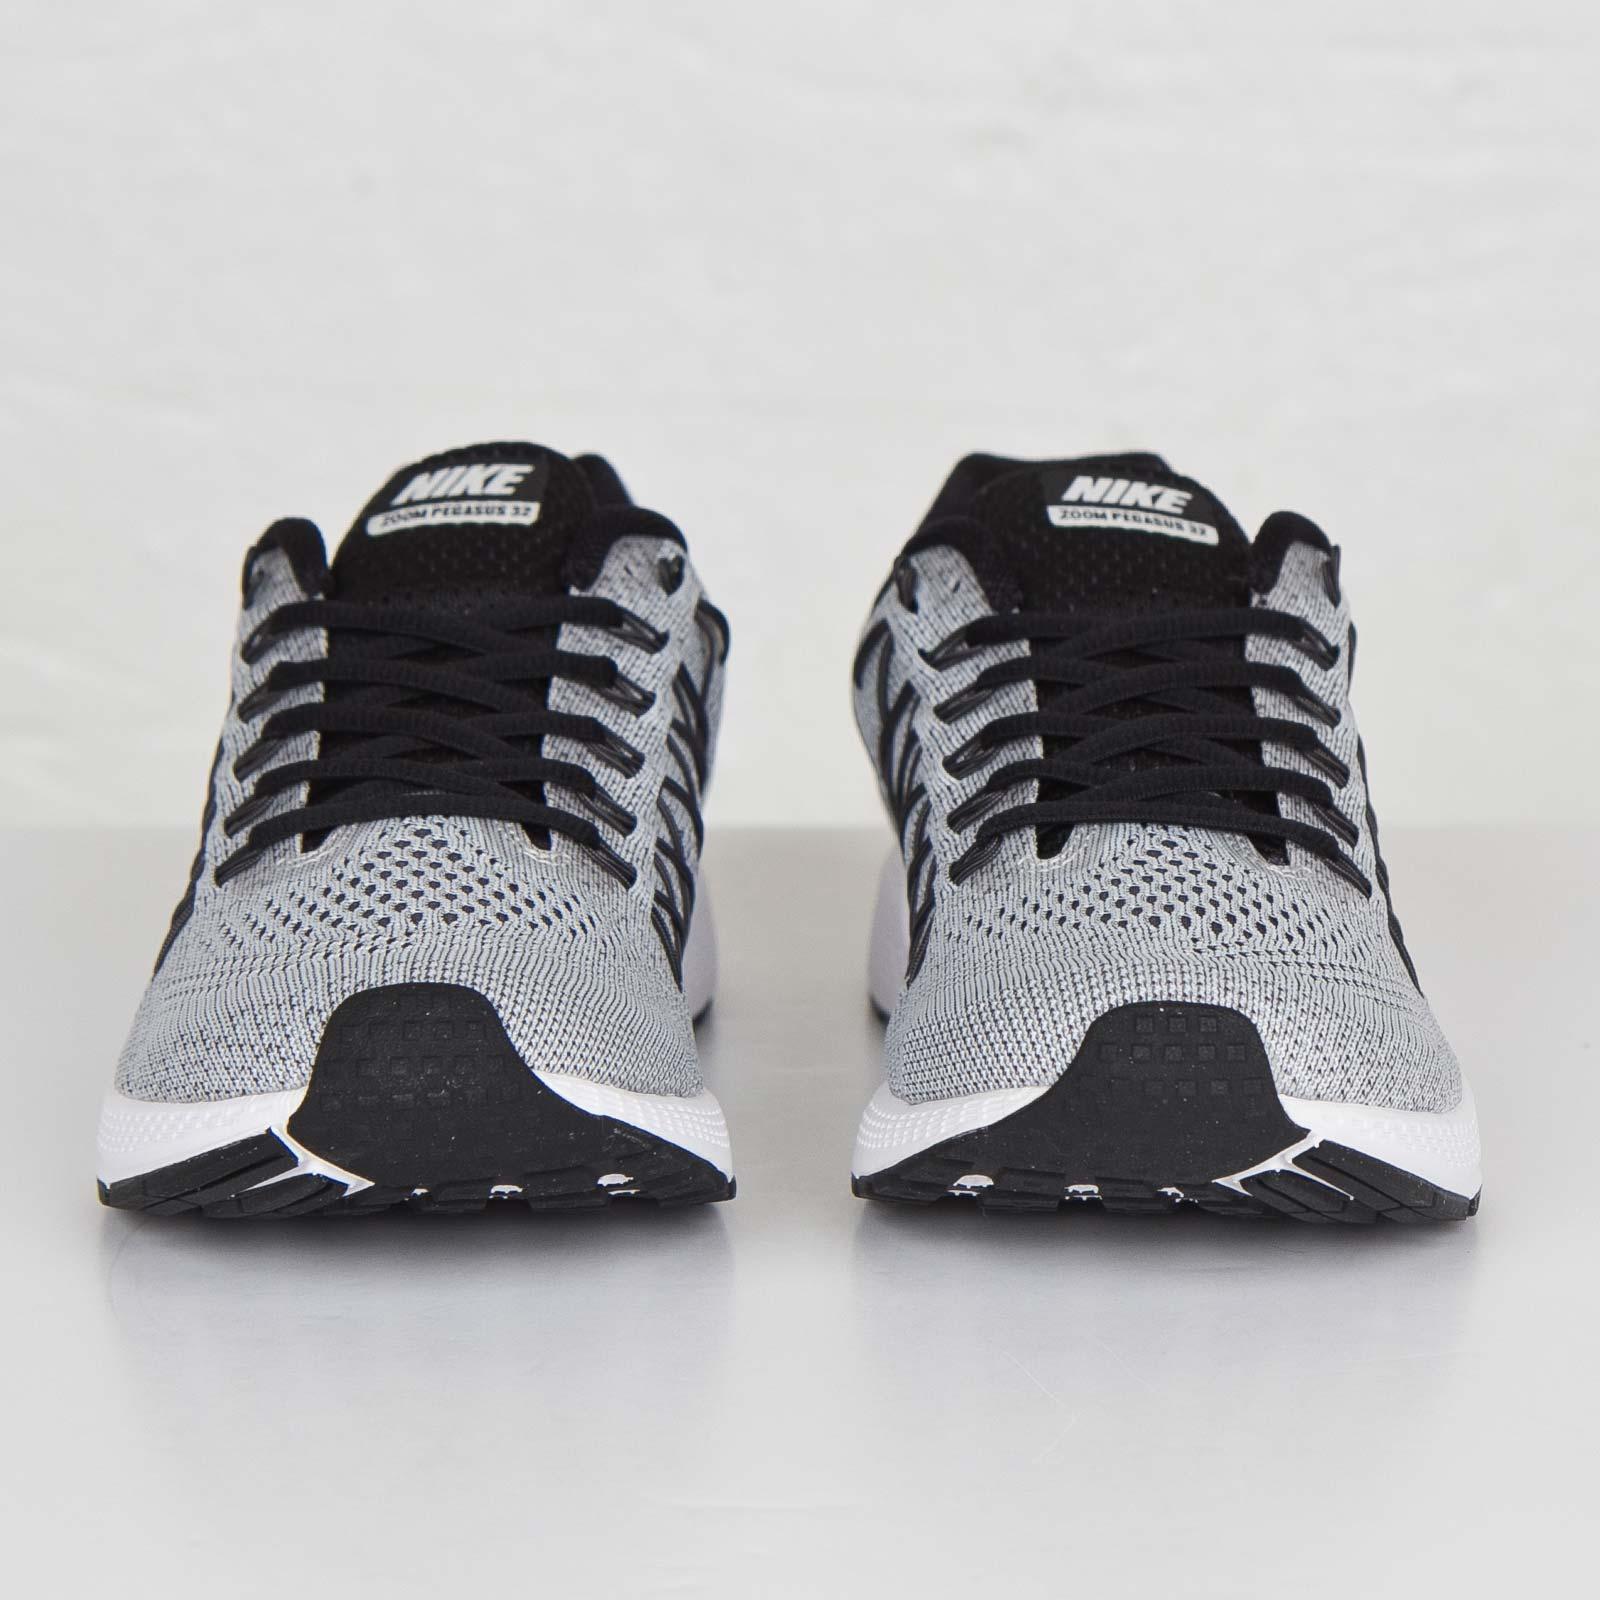 34bdb47a7ba0e7 Nike Air Zoom Pegasus 32 - 749340-002 - Sneakersnstuff